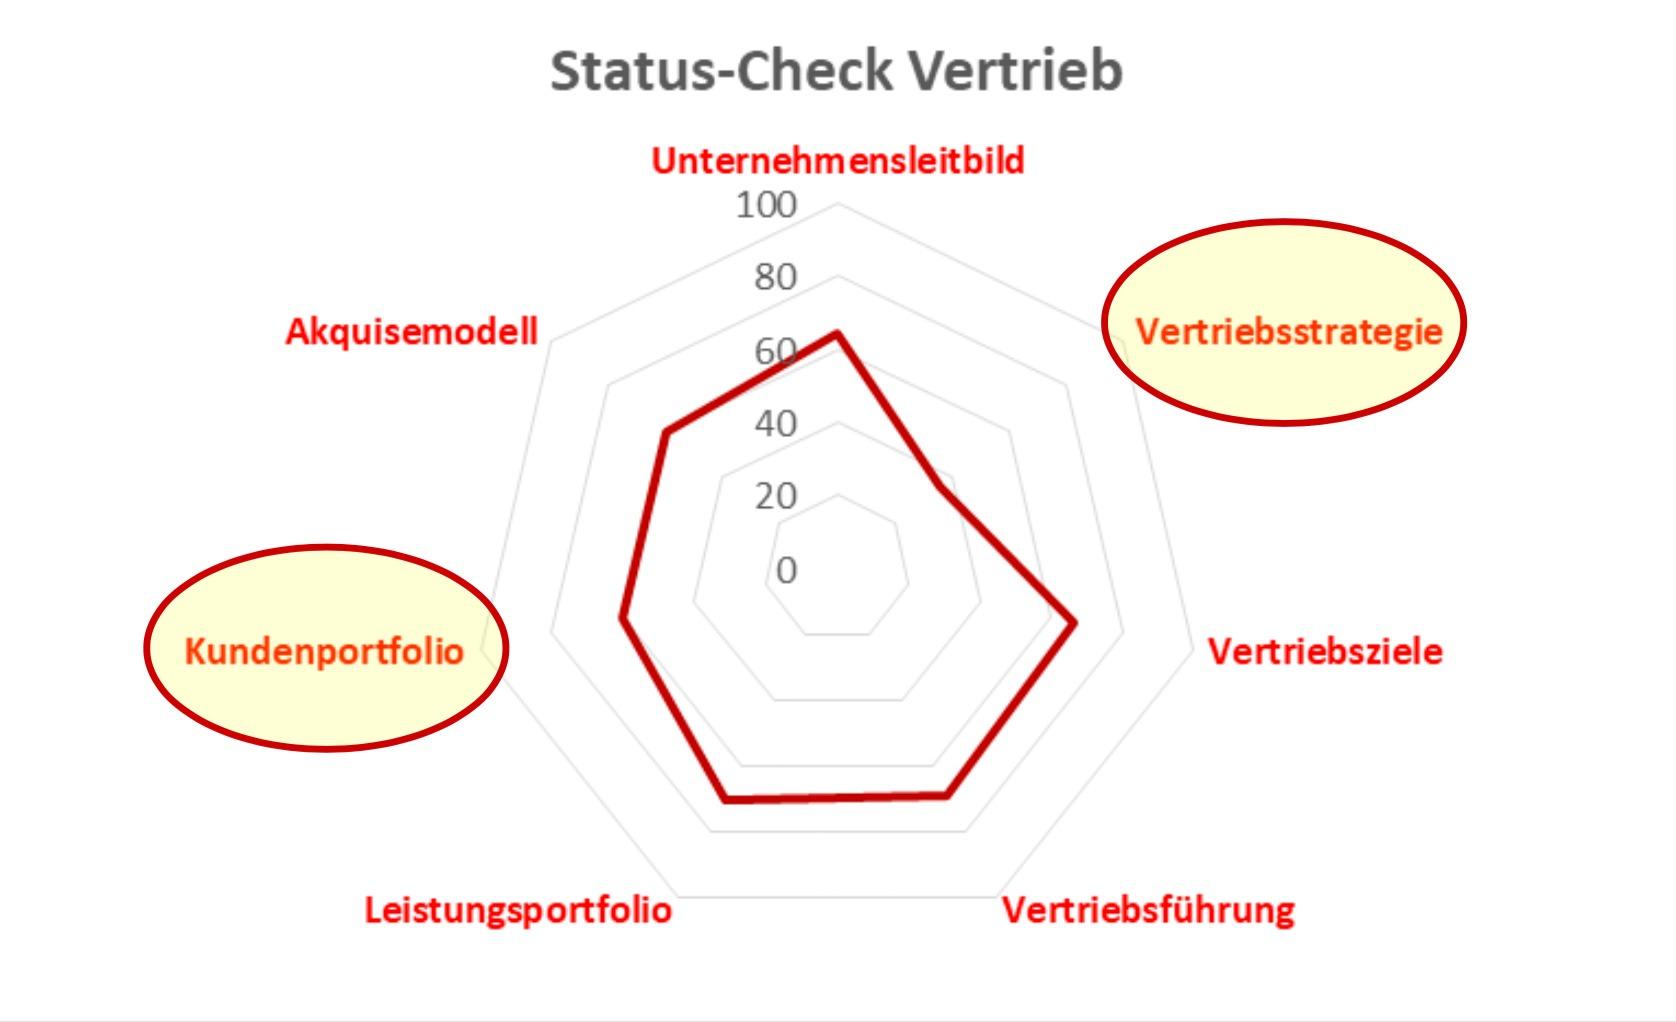 Status-Check-Vertrieb